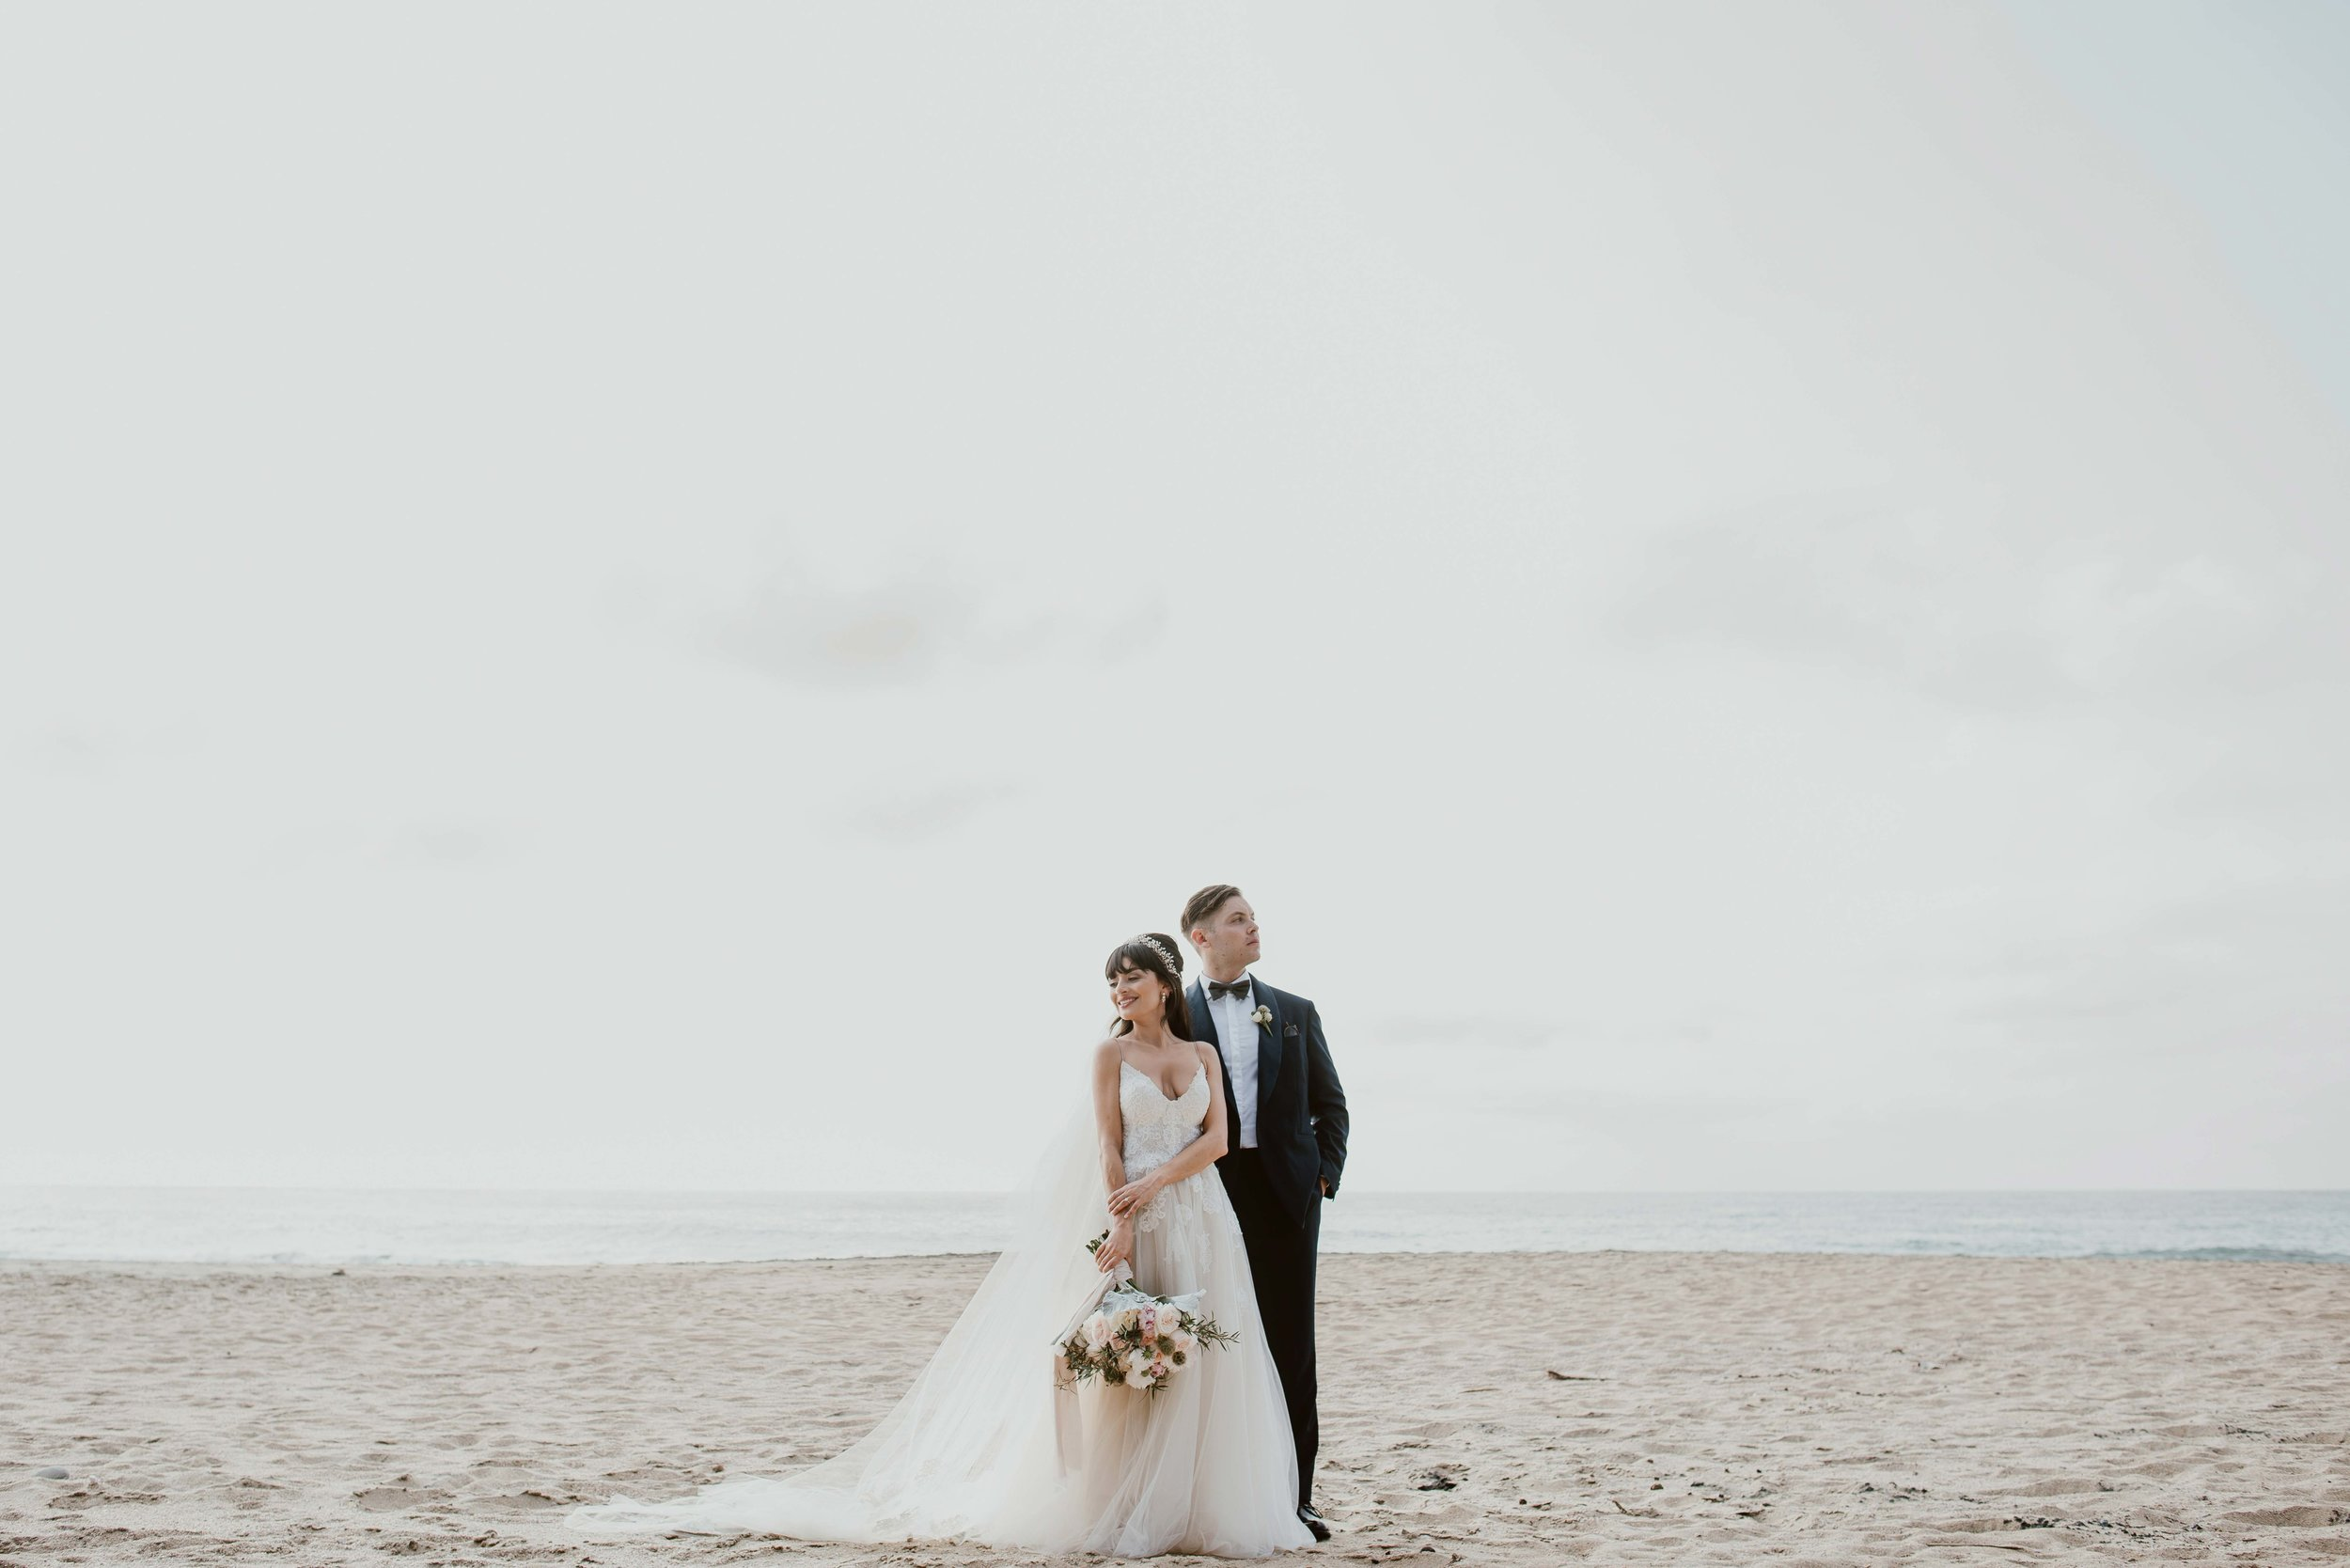 Mariana+Blake Sayulita Wedding-224.jpg